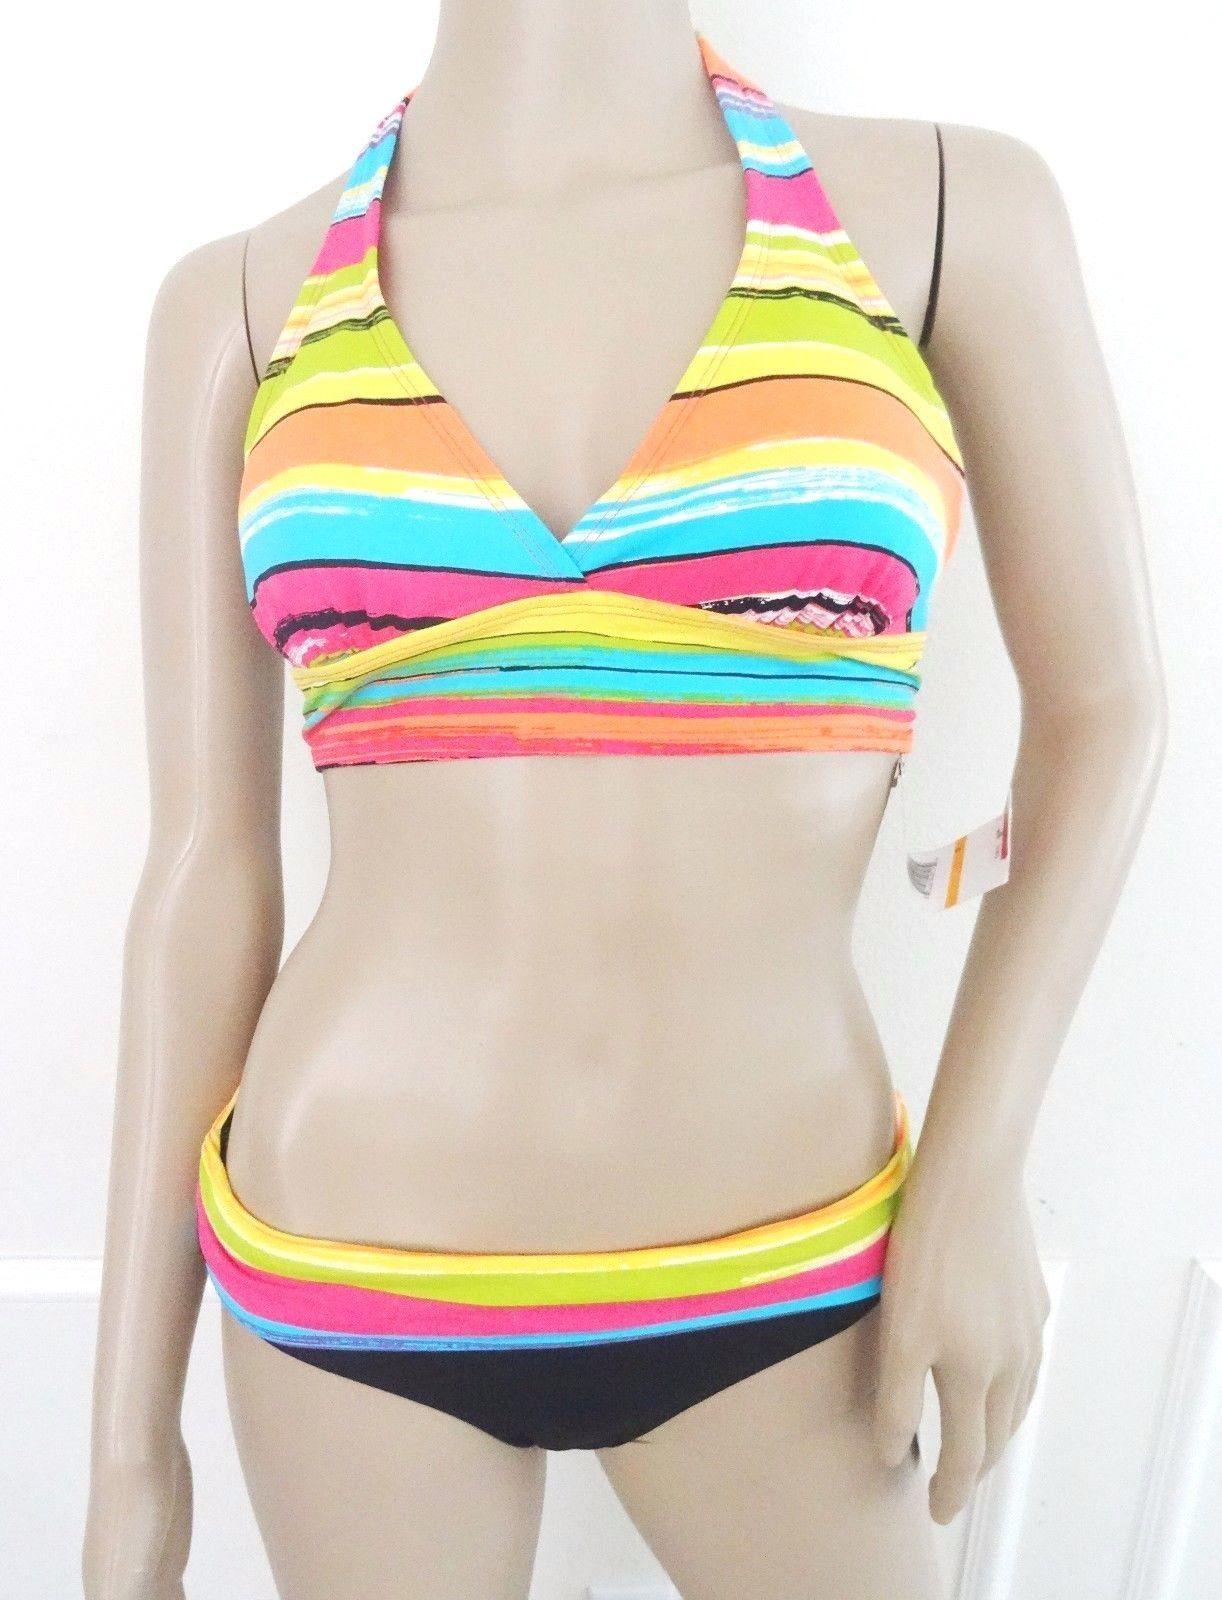 Nwt Anne ColeSwimsuit Halter Swimwear Bikini 2 PC Set Sz S Small Black Yellow - $44.50